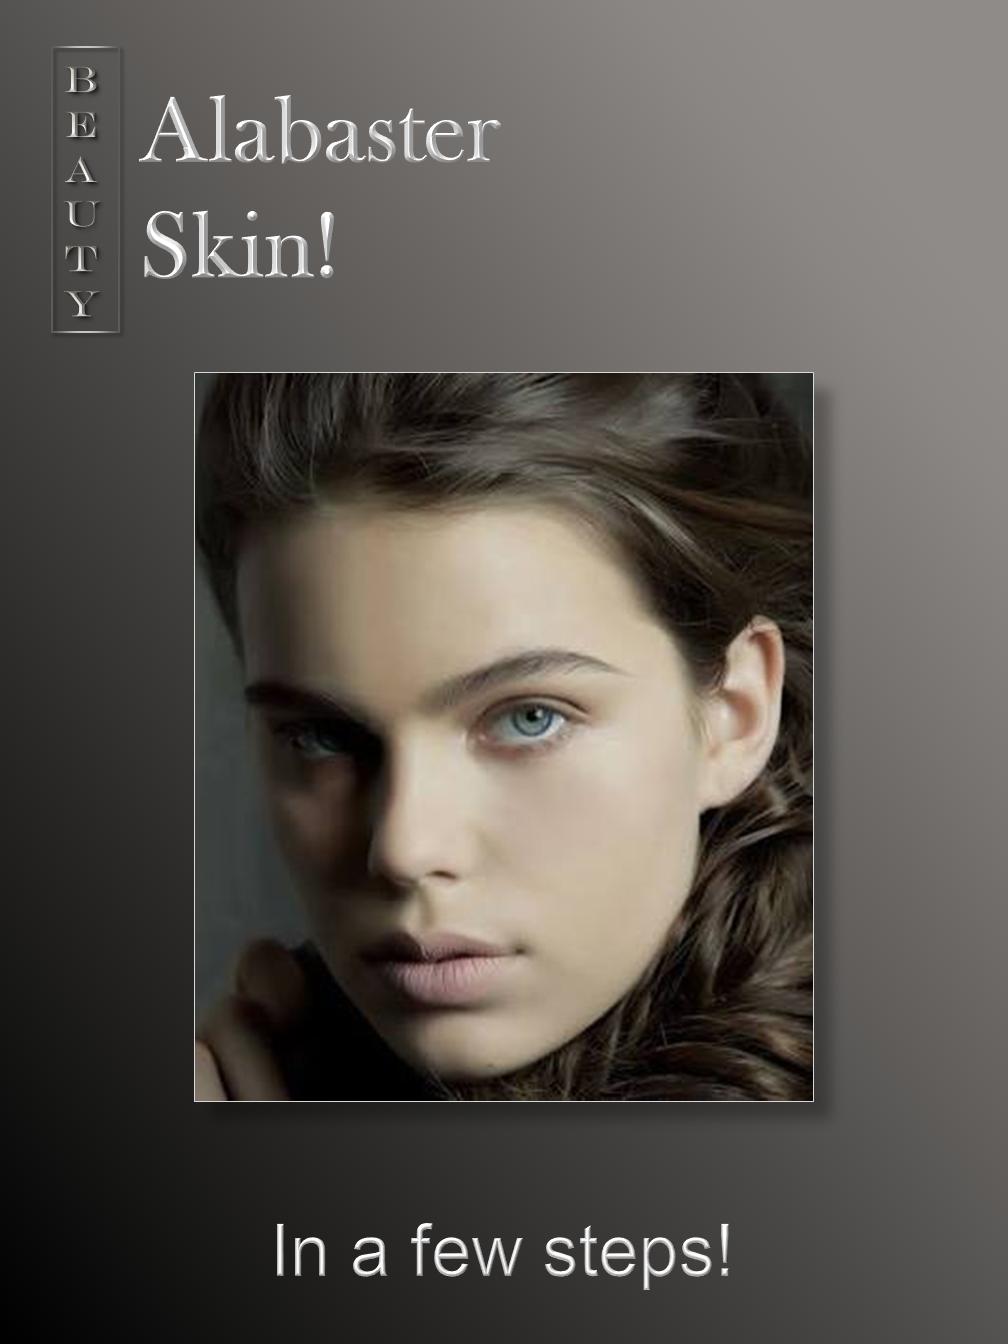 Alabaster Skin